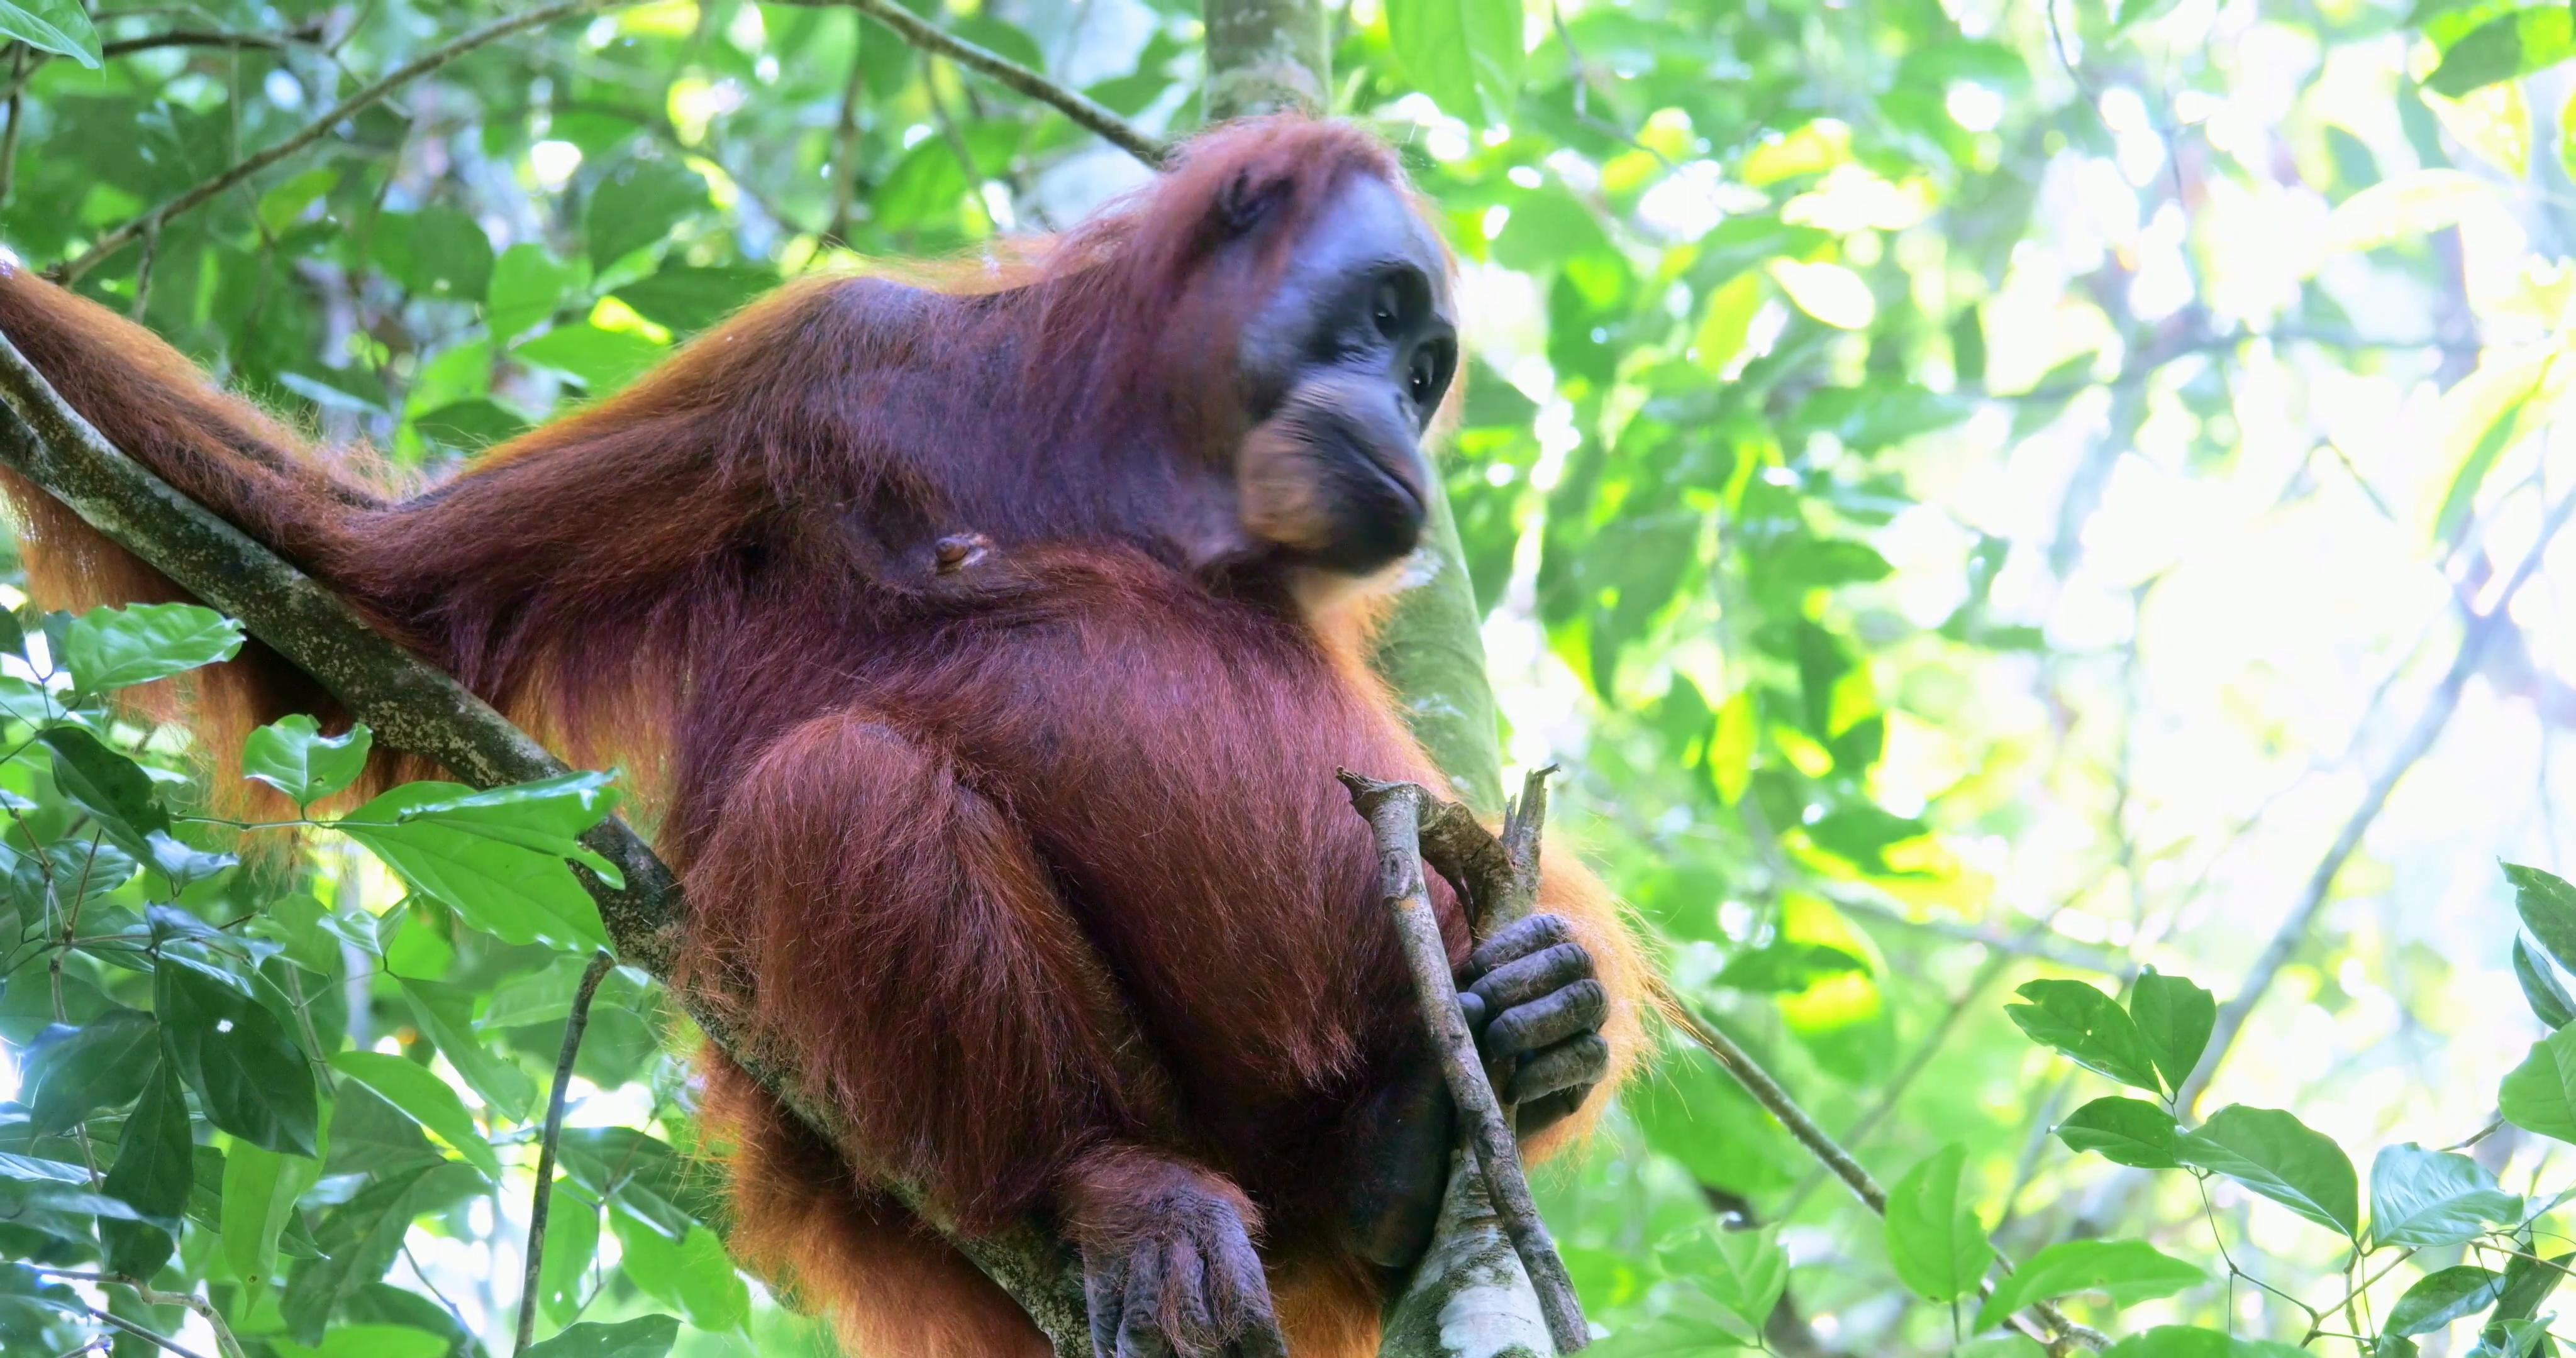 Wild orangutan monkey listening to sound of wildlife in protected ...